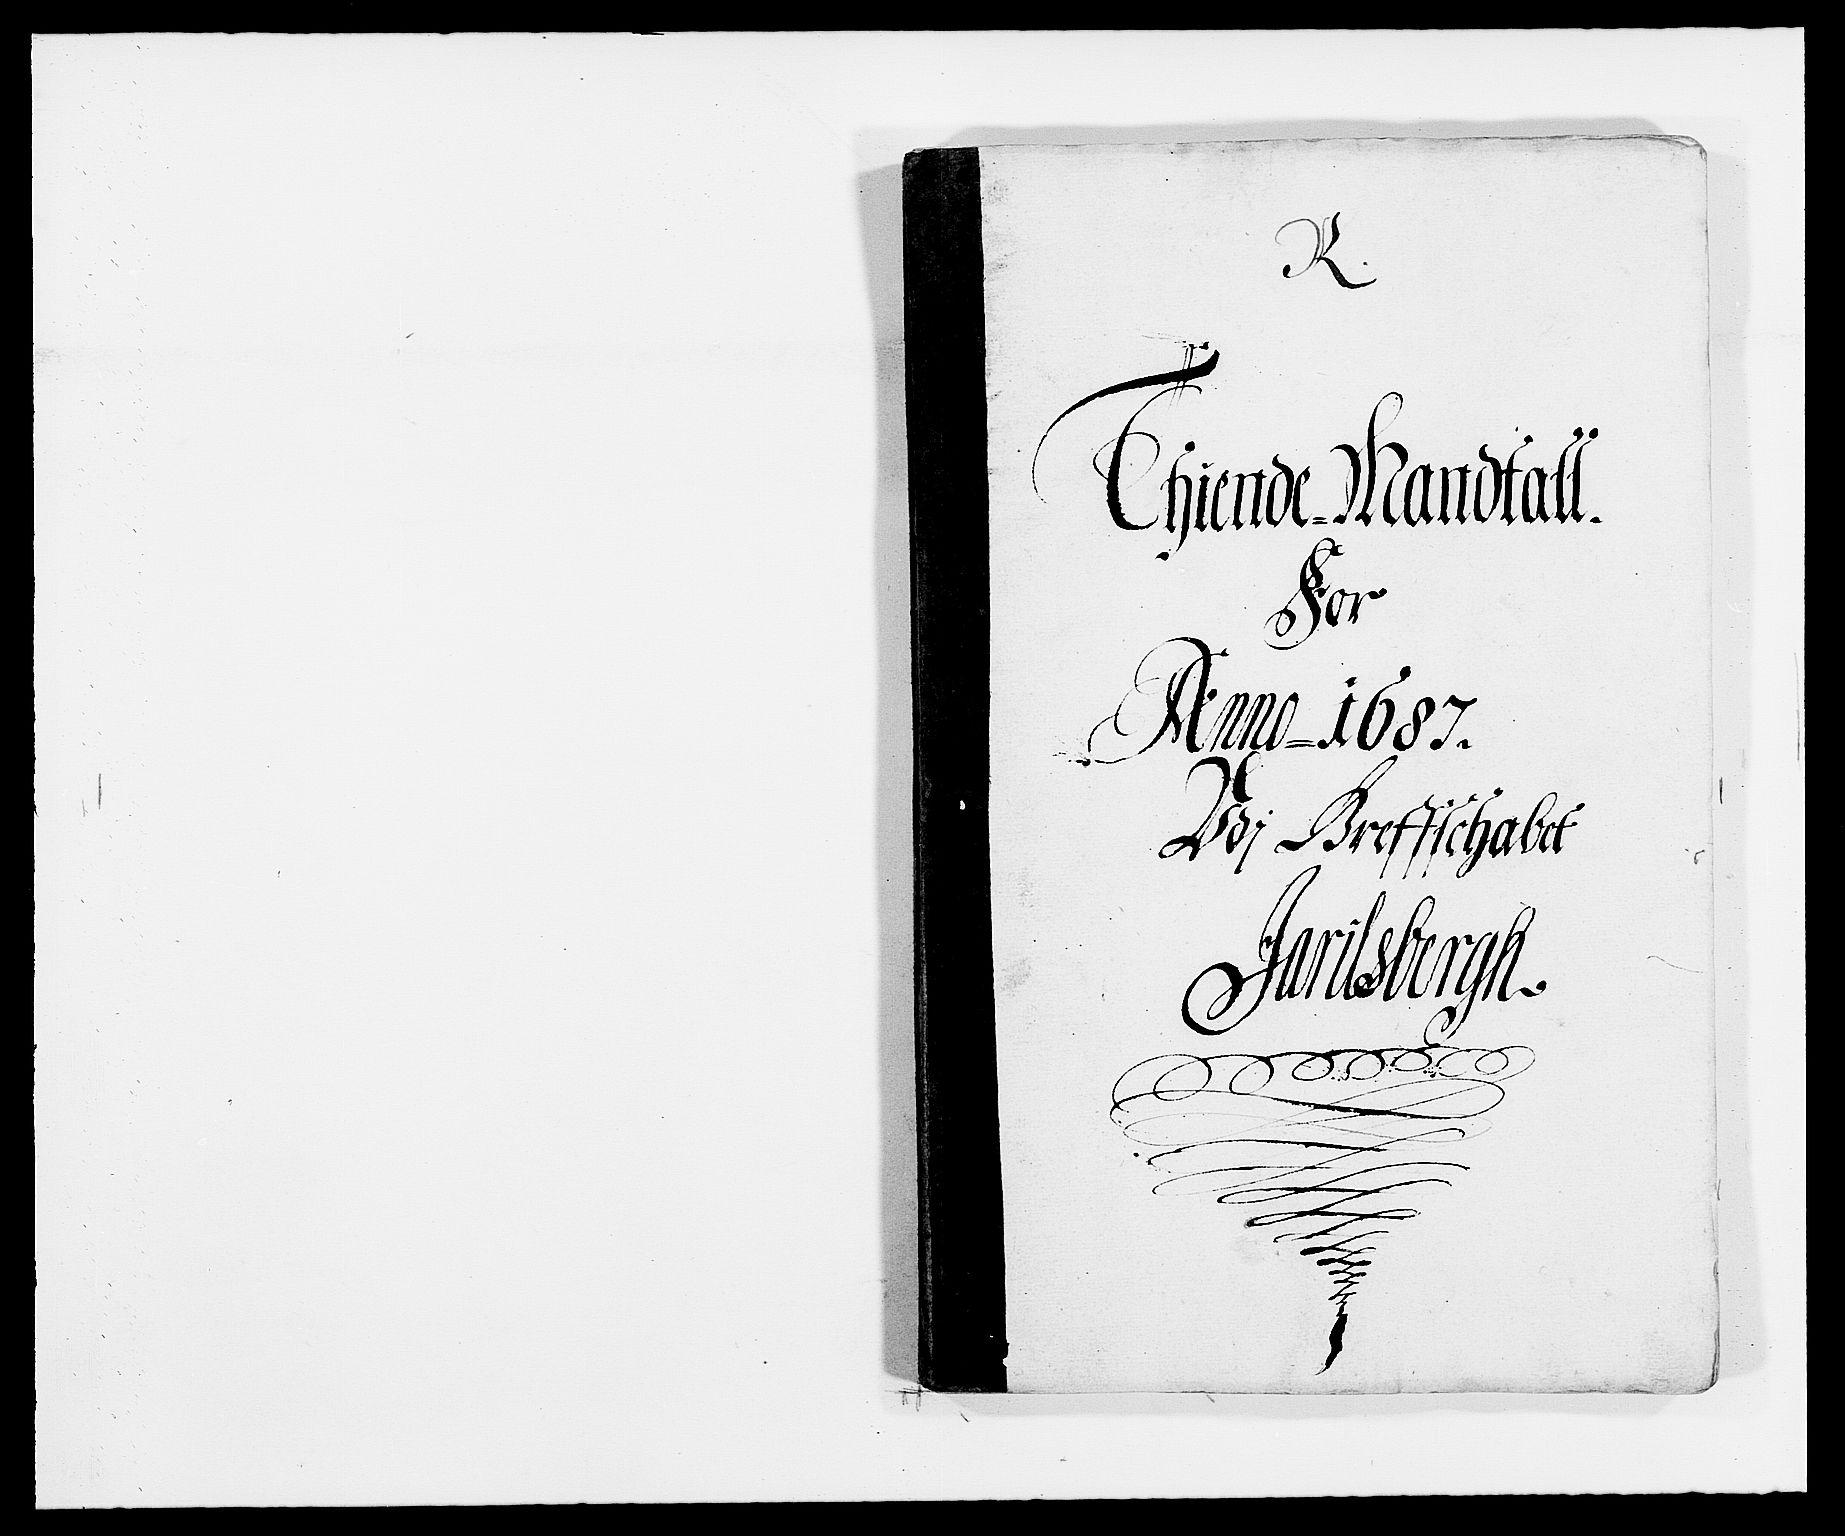 RA, Rentekammeret inntil 1814, Reviderte regnskaper, Fogderegnskap, R32/L1858: Fogderegnskap Jarlsberg grevskap, 1686-1690, s. 231